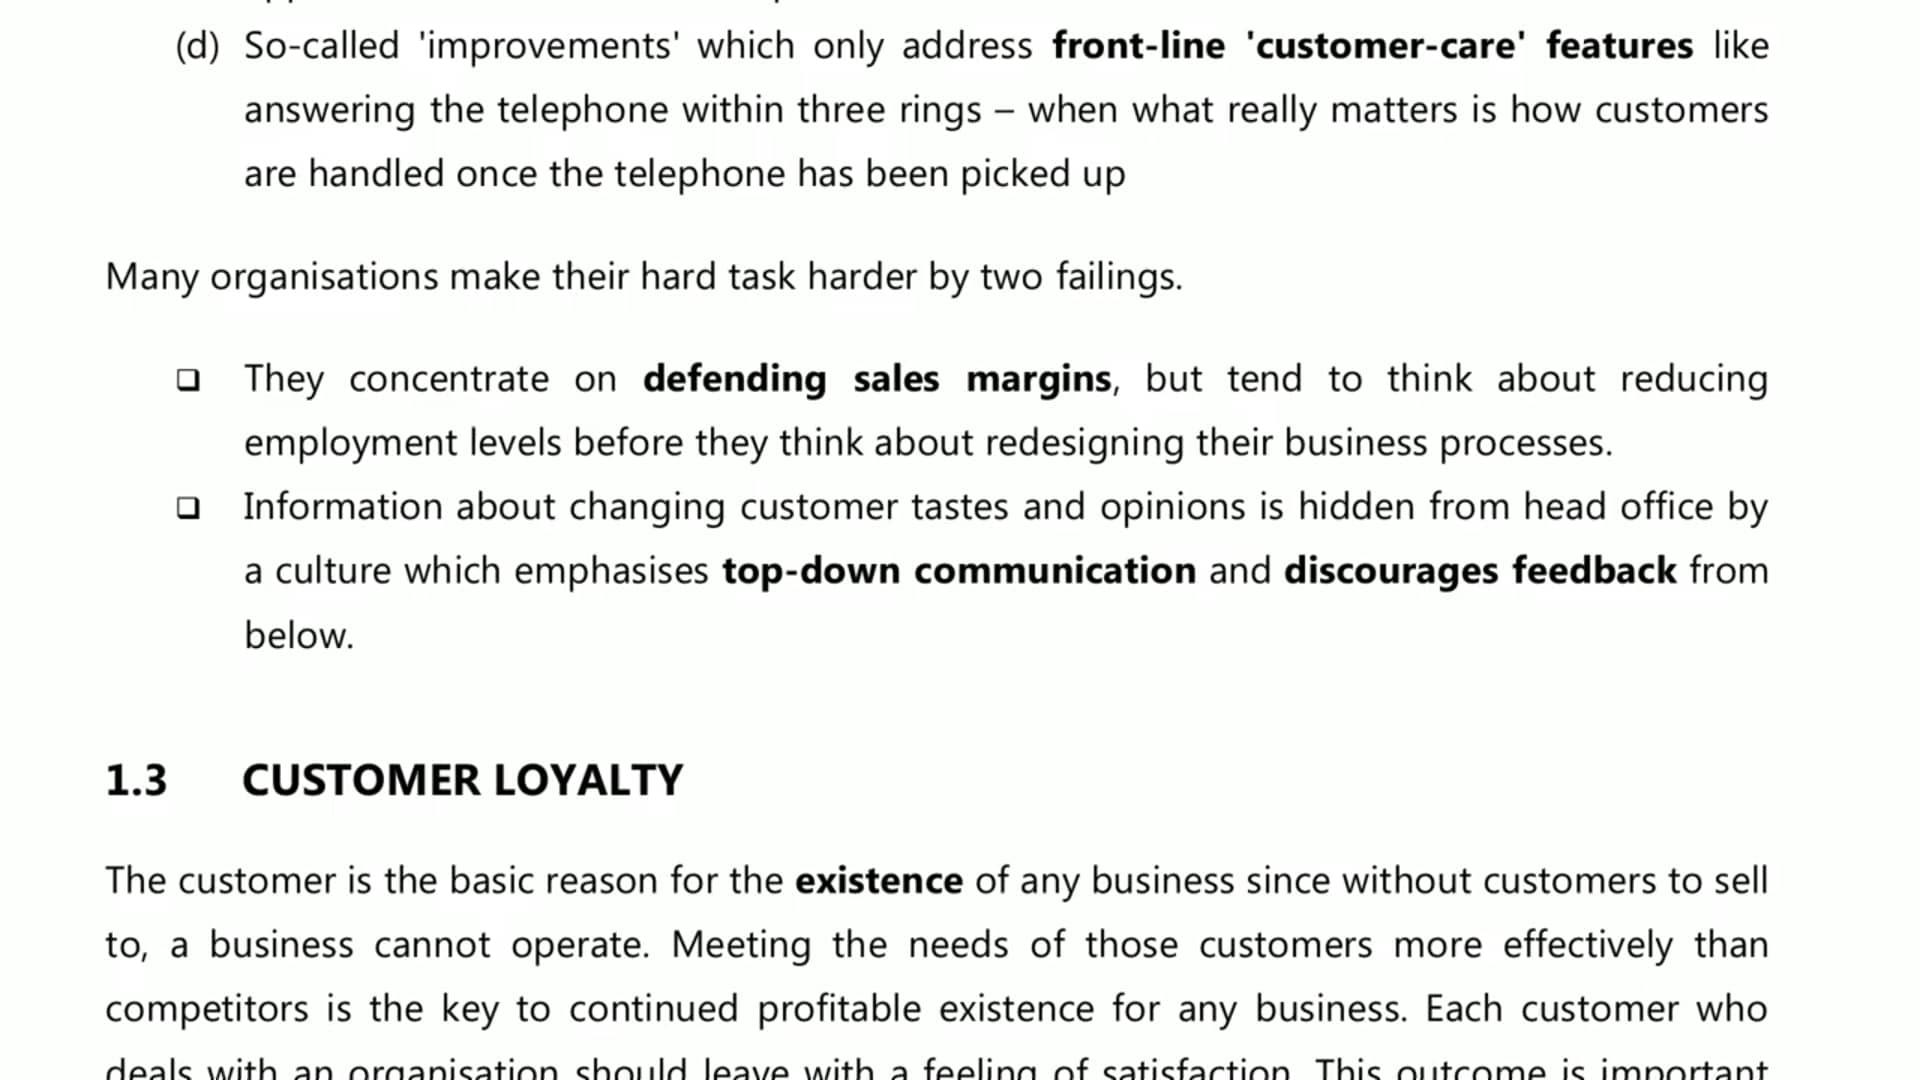 Ch 3 Customer Focus